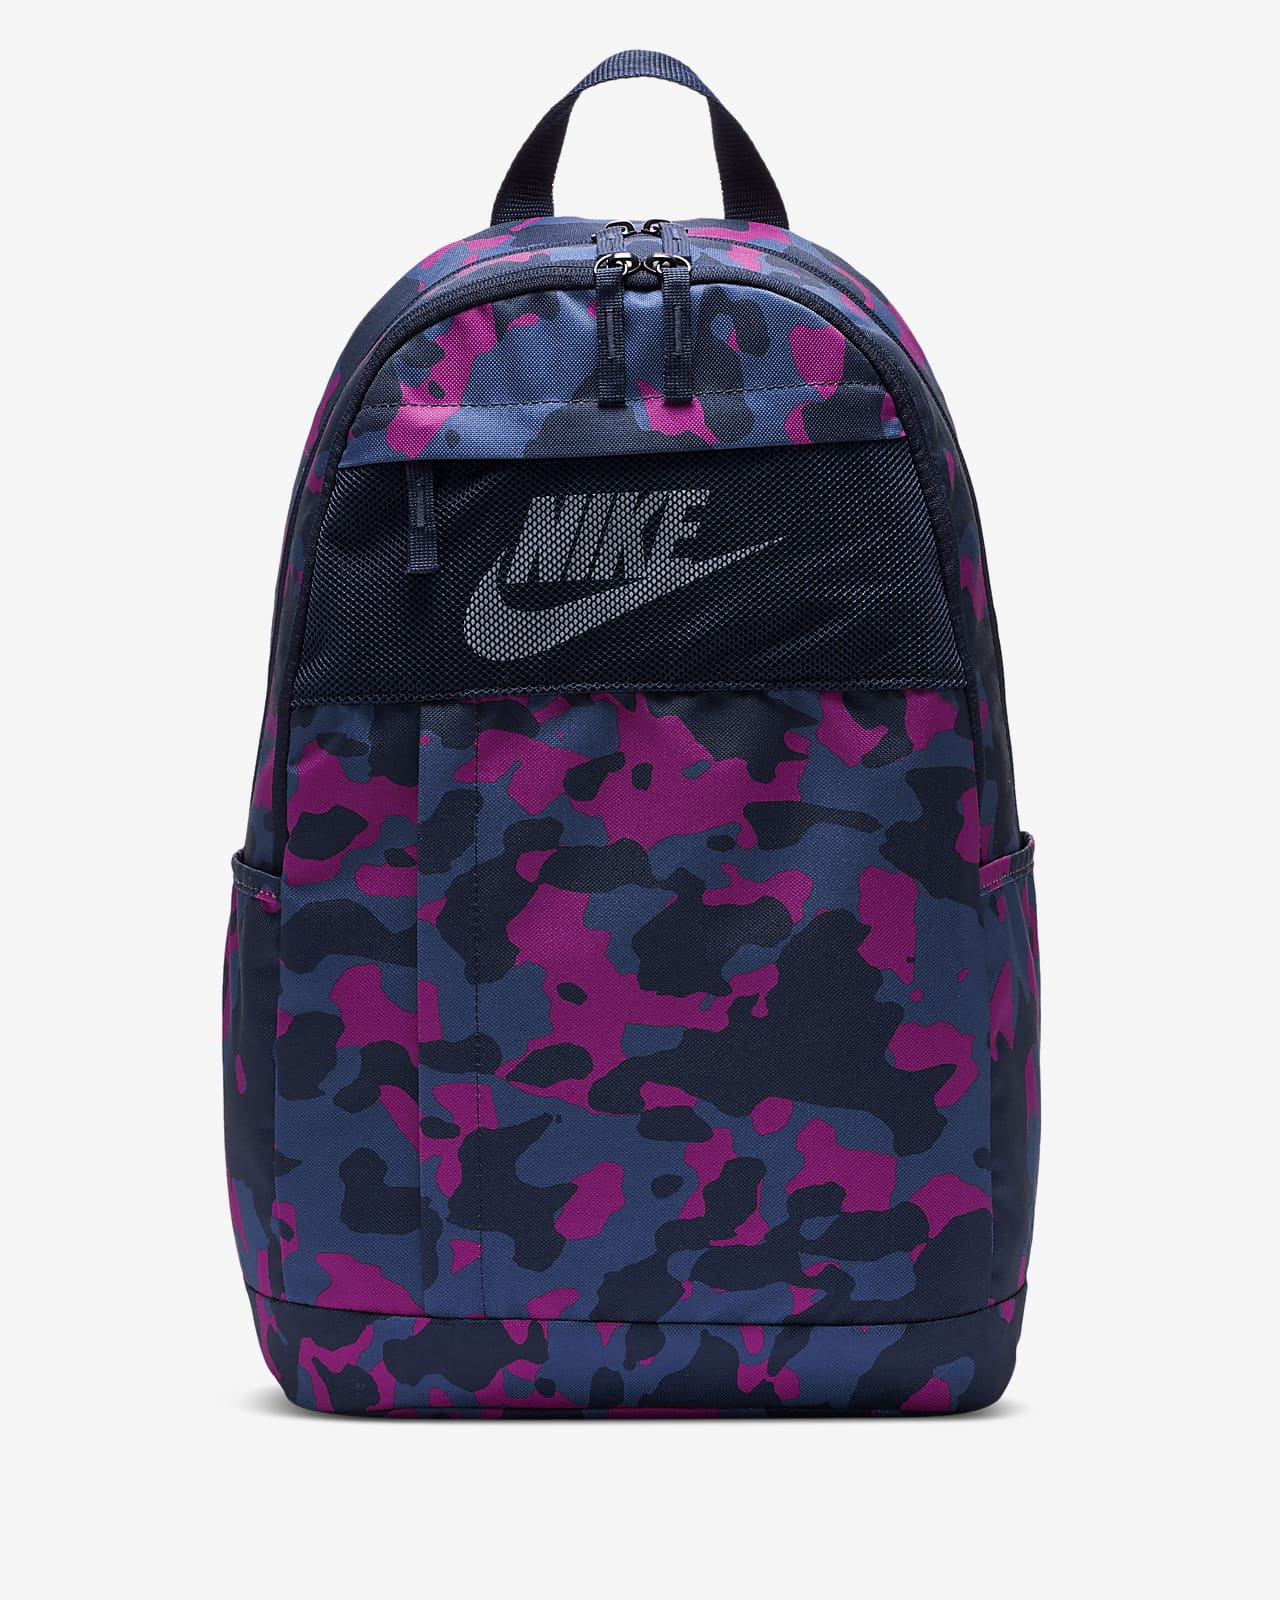 Nike Elemental 2.0 Printed Backpack